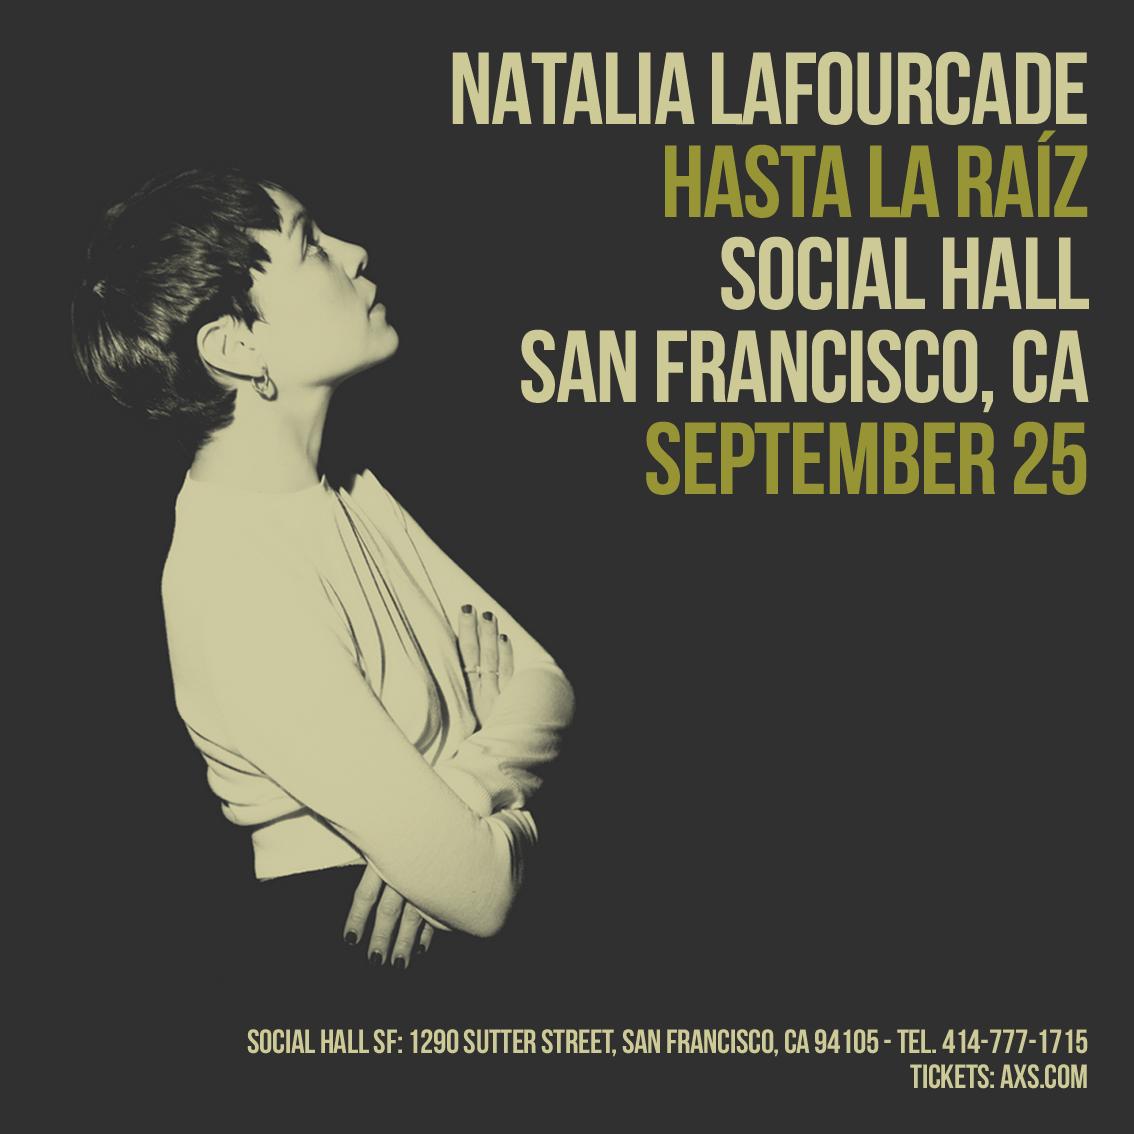 Lafourcade_SocialHall-SF_Tickets_Insta